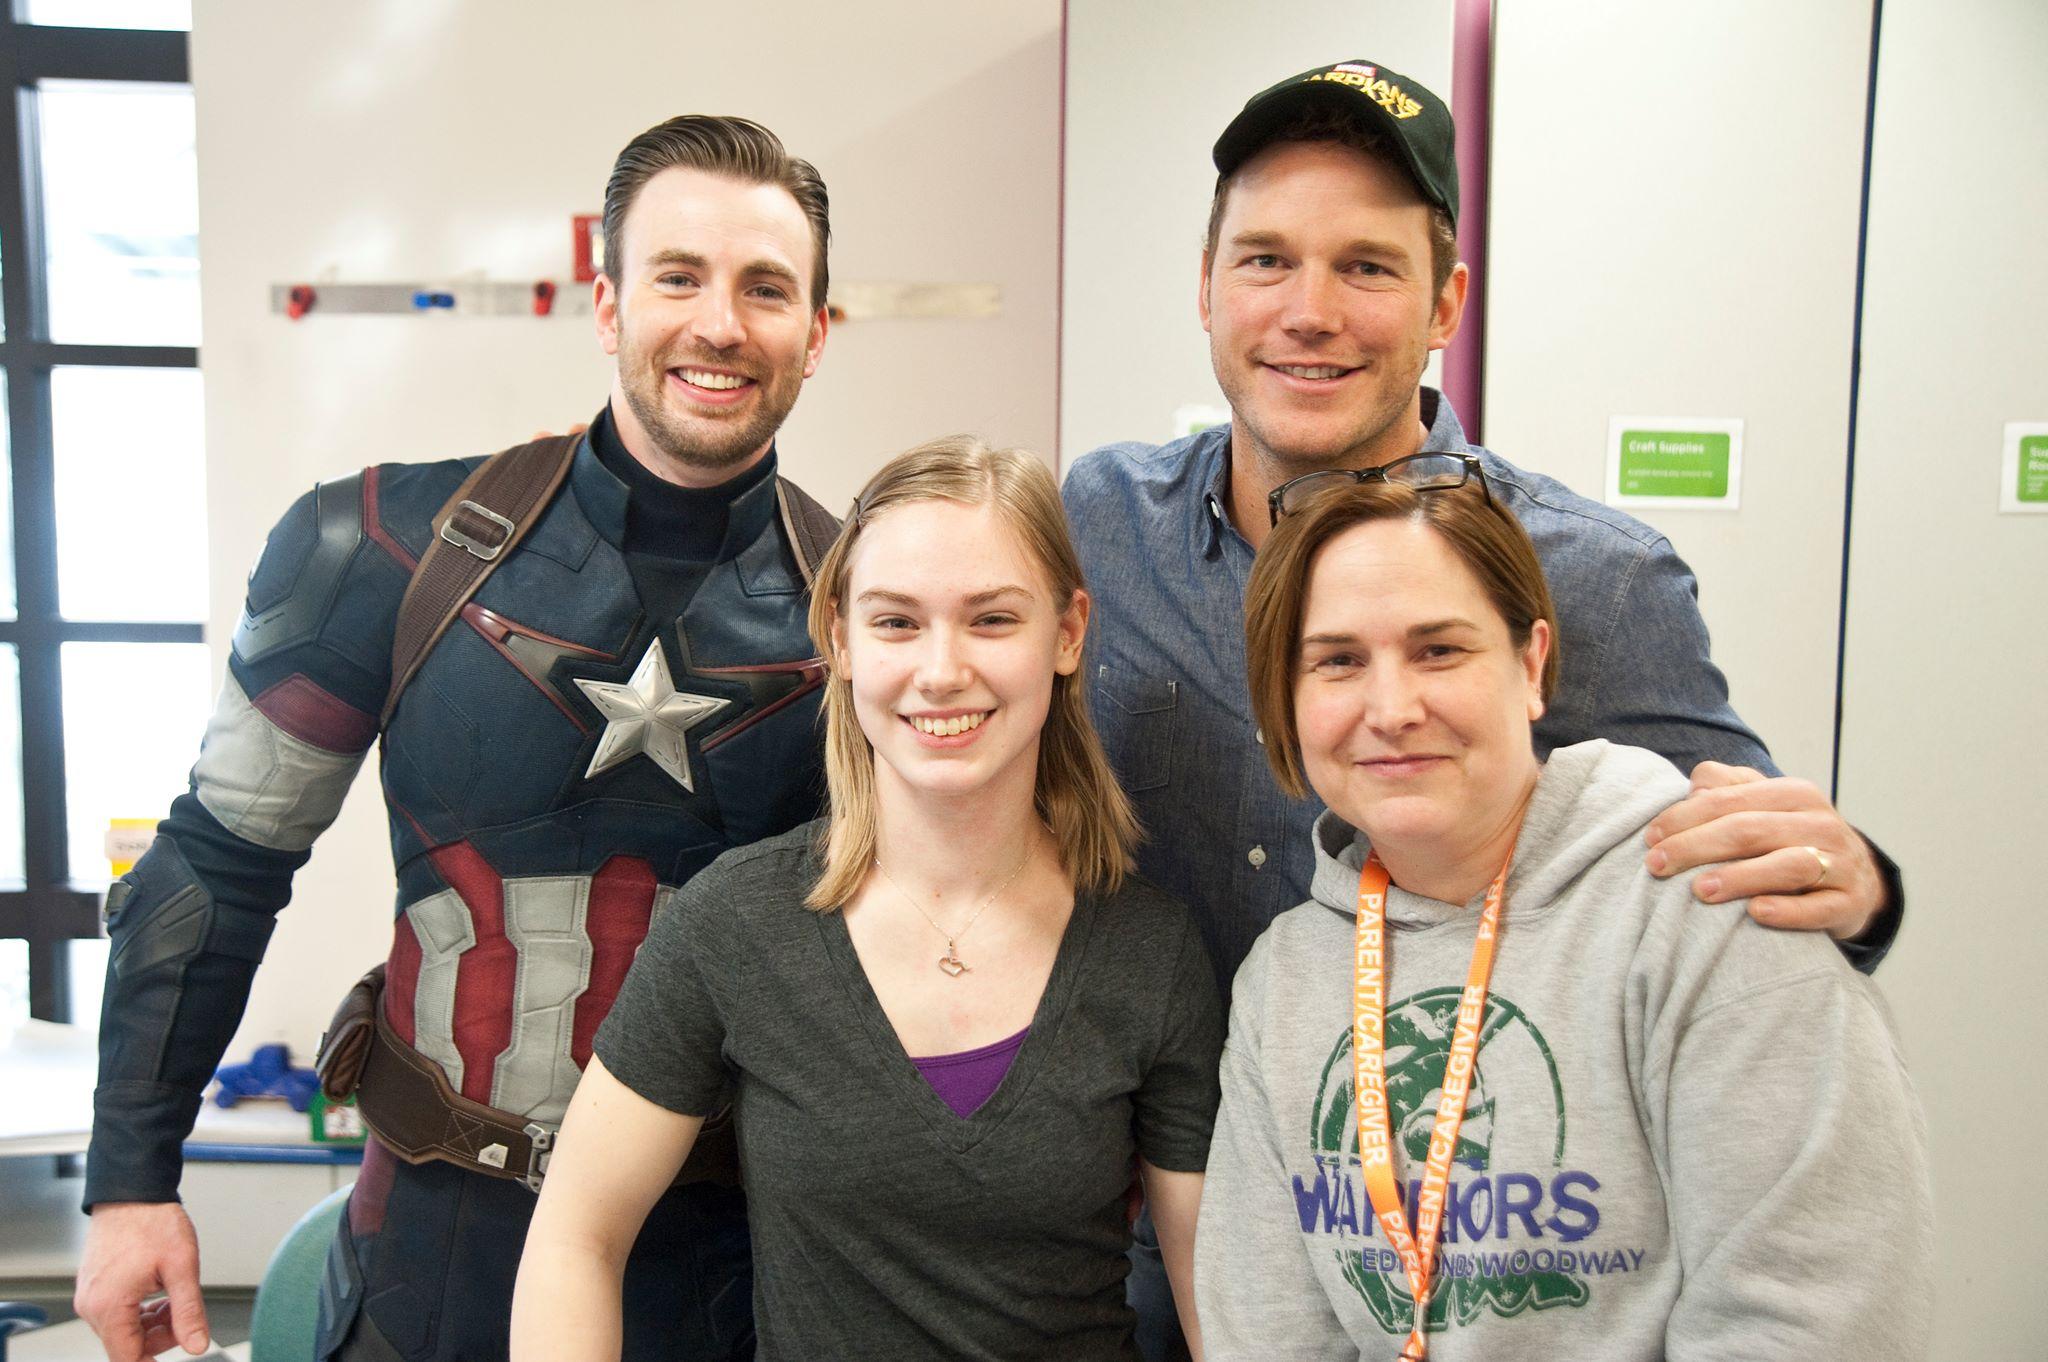 Captain-America-Star-Lord-Hopitaux-Enfants-3